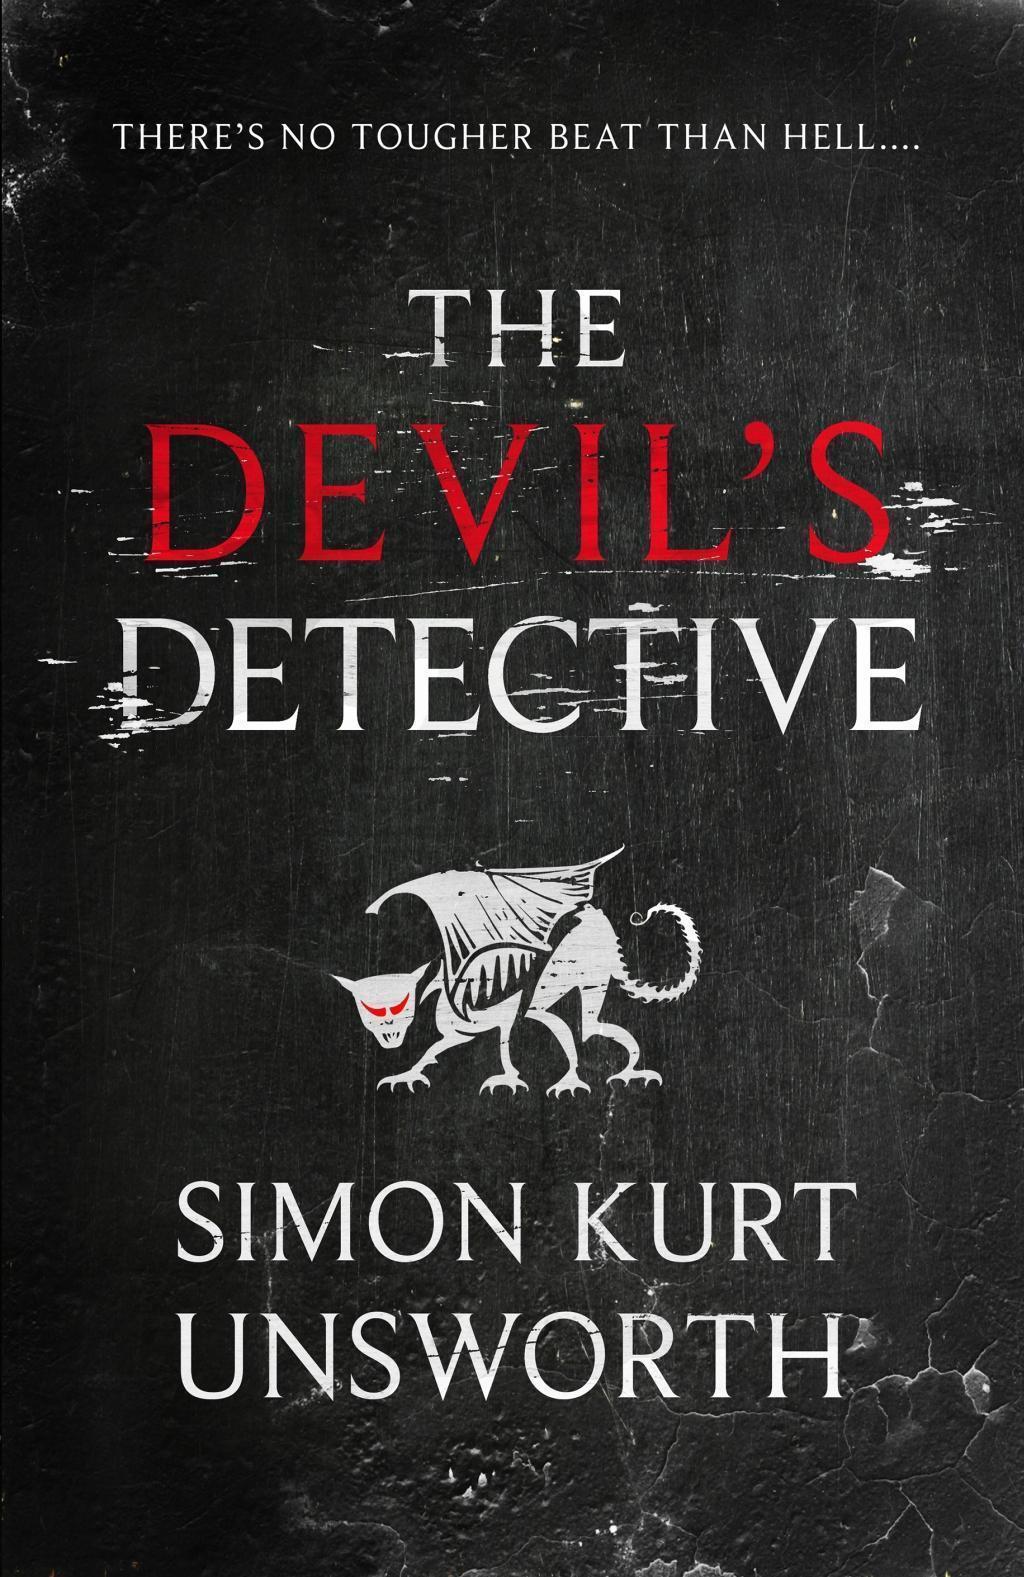 The Devil's Detective